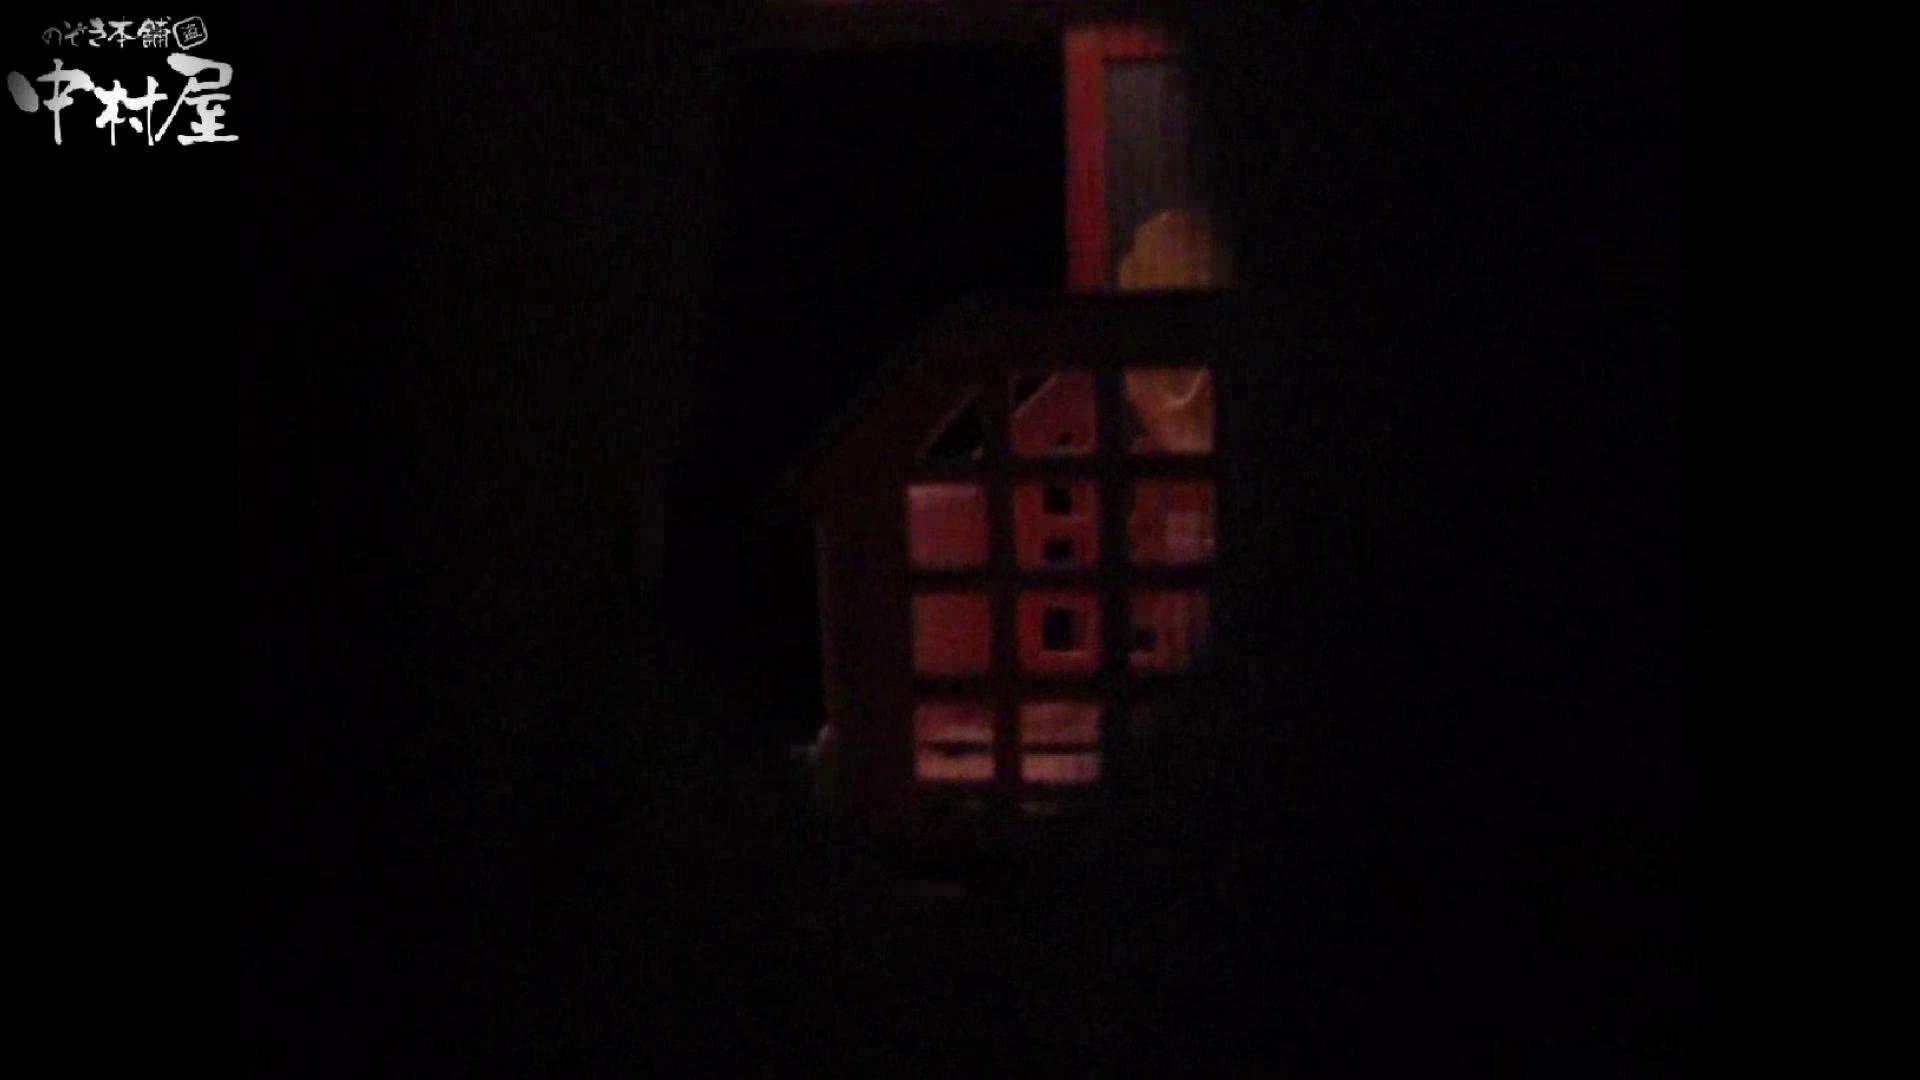 民家風呂専門盗撮師の超危険映像 vol.020 OLのエロ生活   盗撮  57連発 19